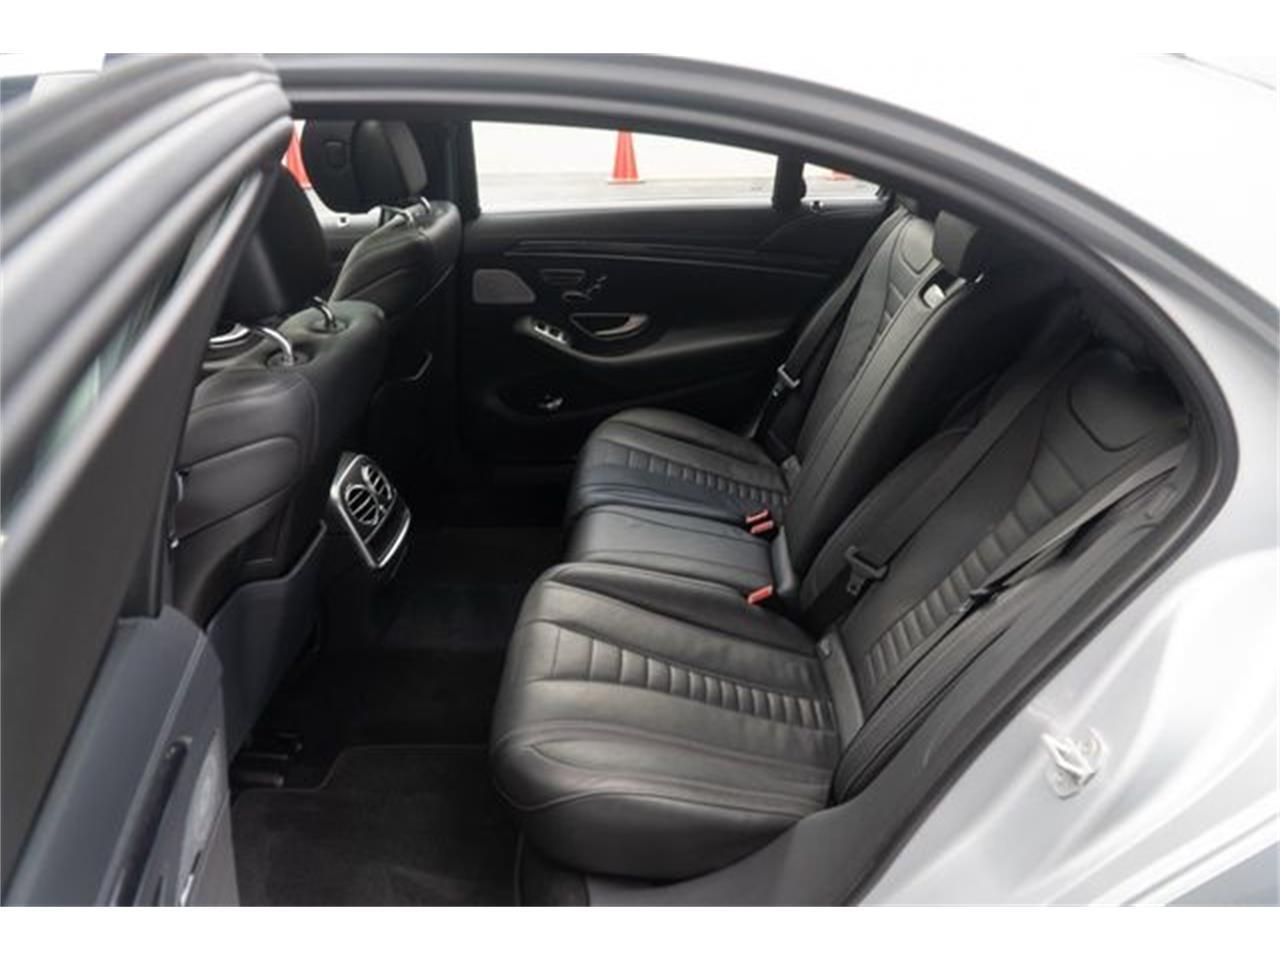 2018 Mercedes-Benz S-Class (CC-1352355) for sale in Miami, Florida